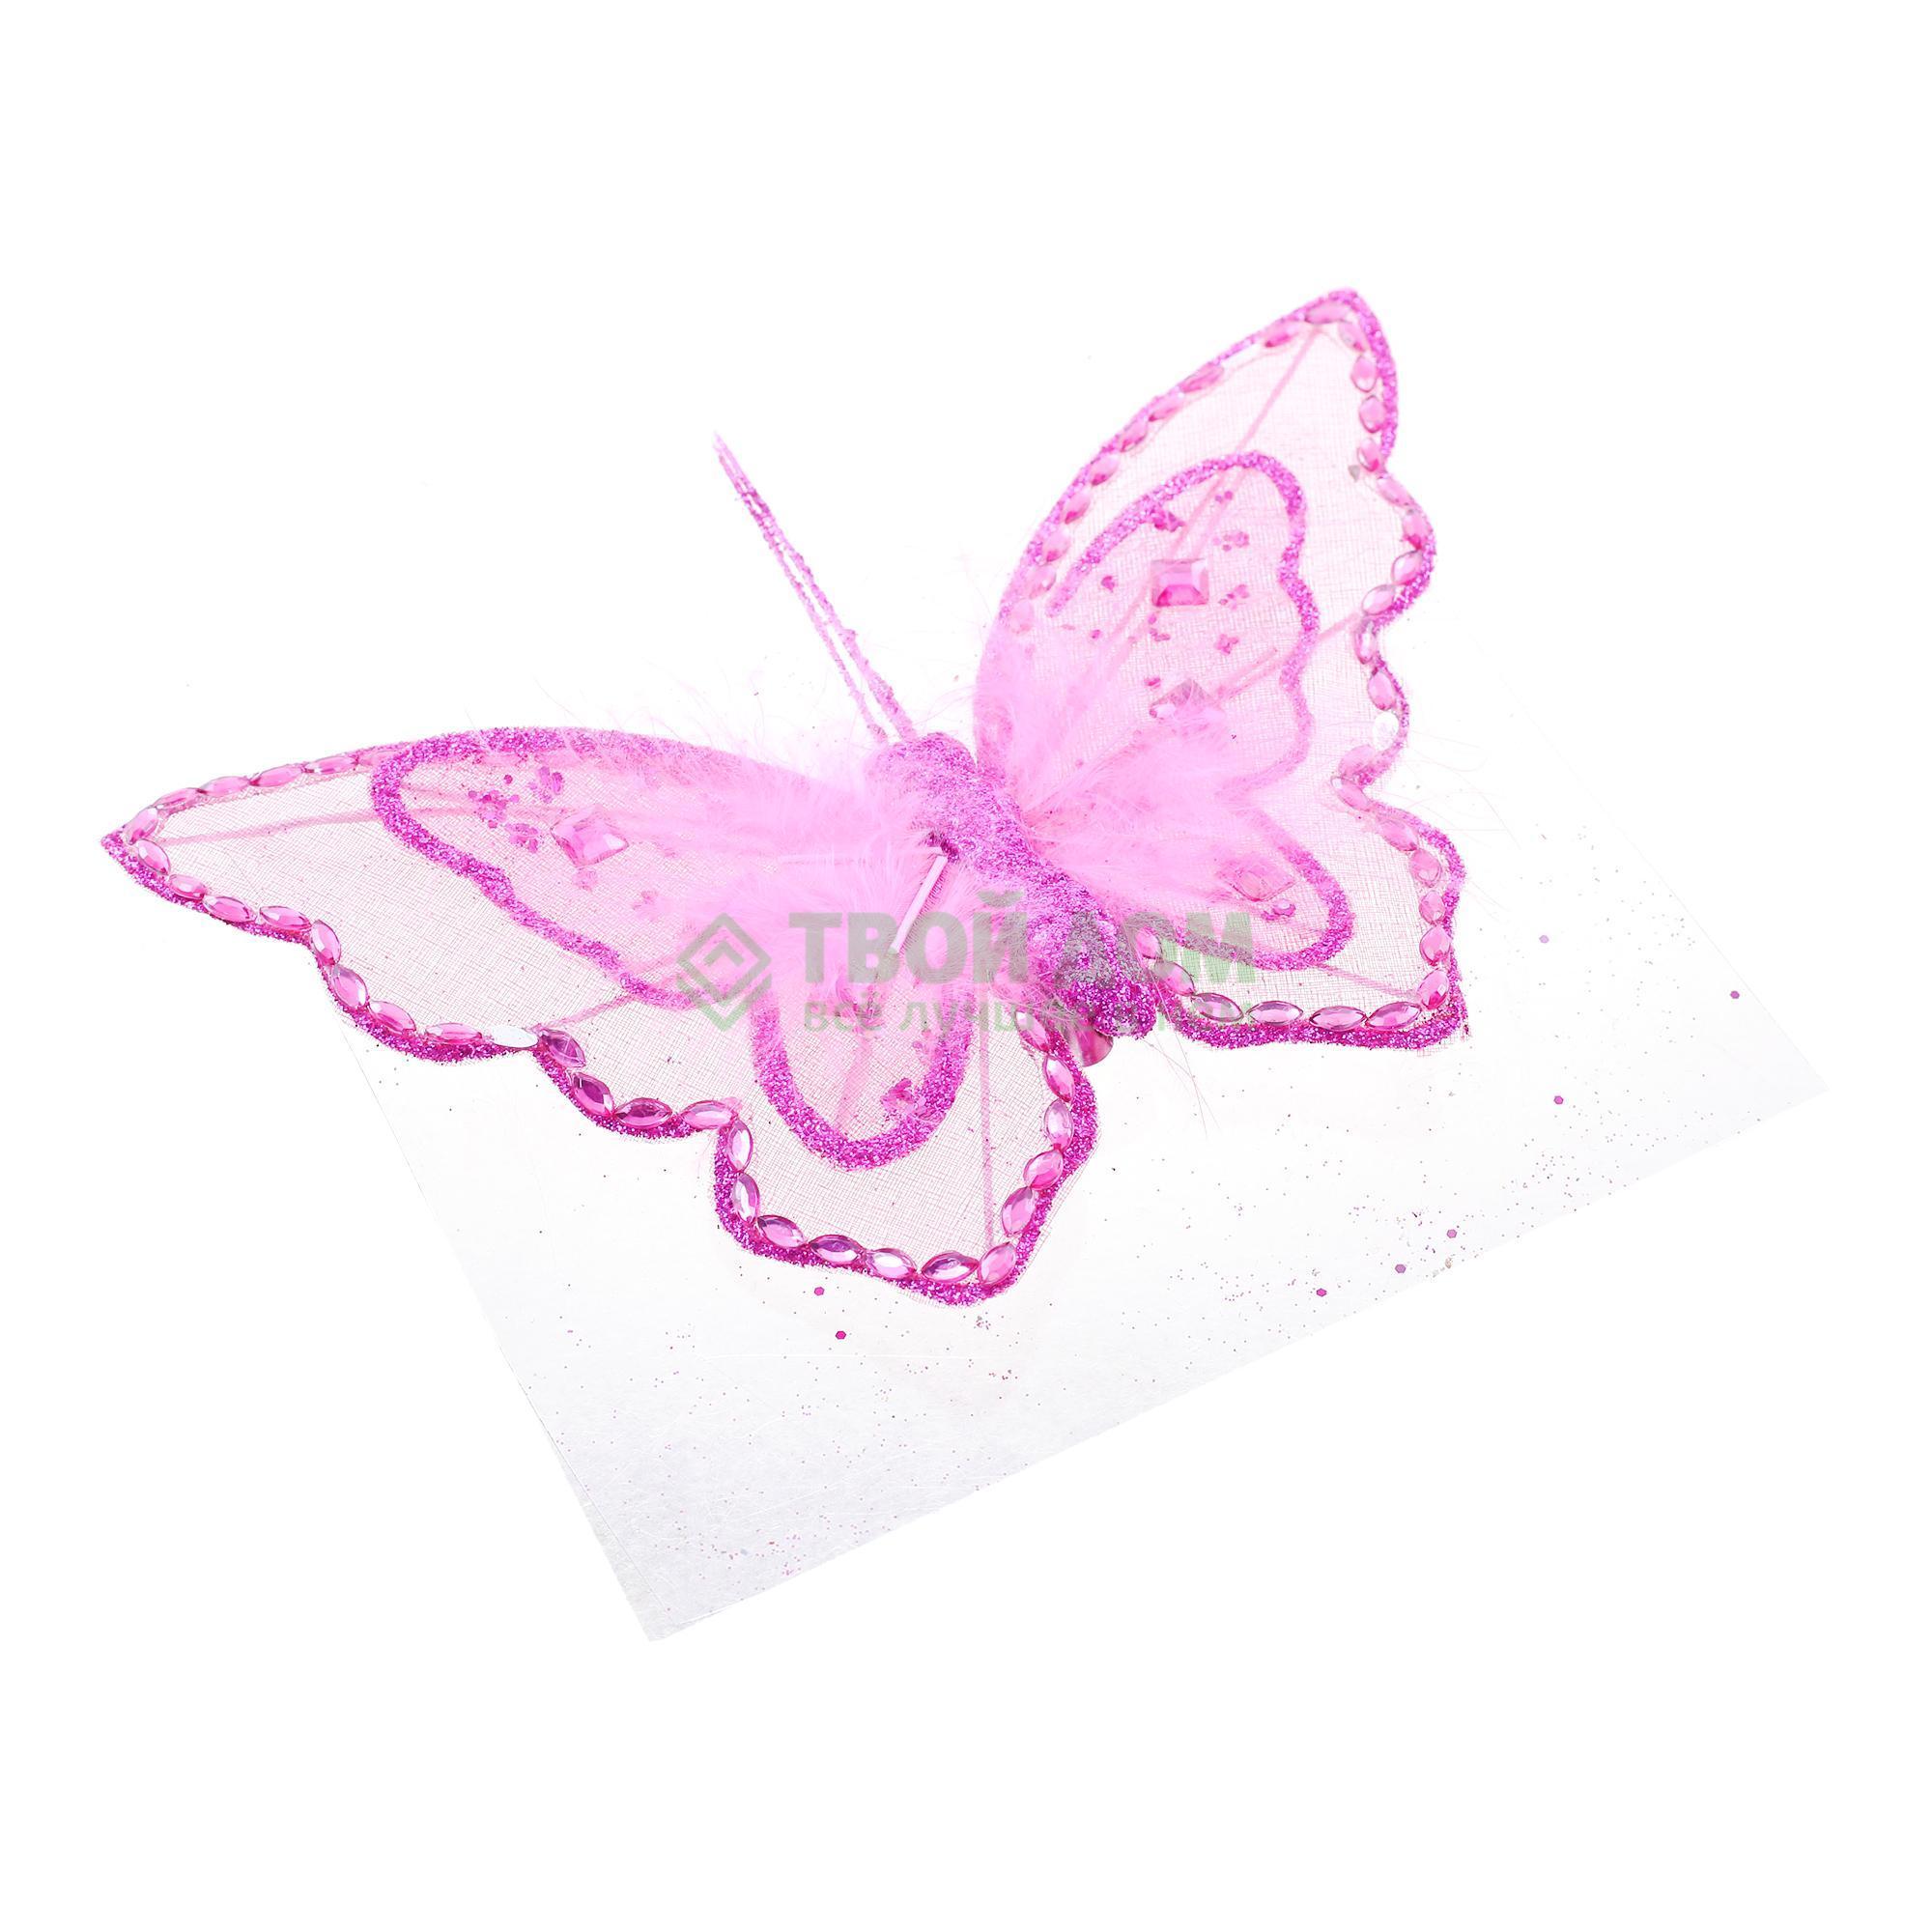 Фигурка KaemingK Бабочка на клипсе 16см фуксия (703942)